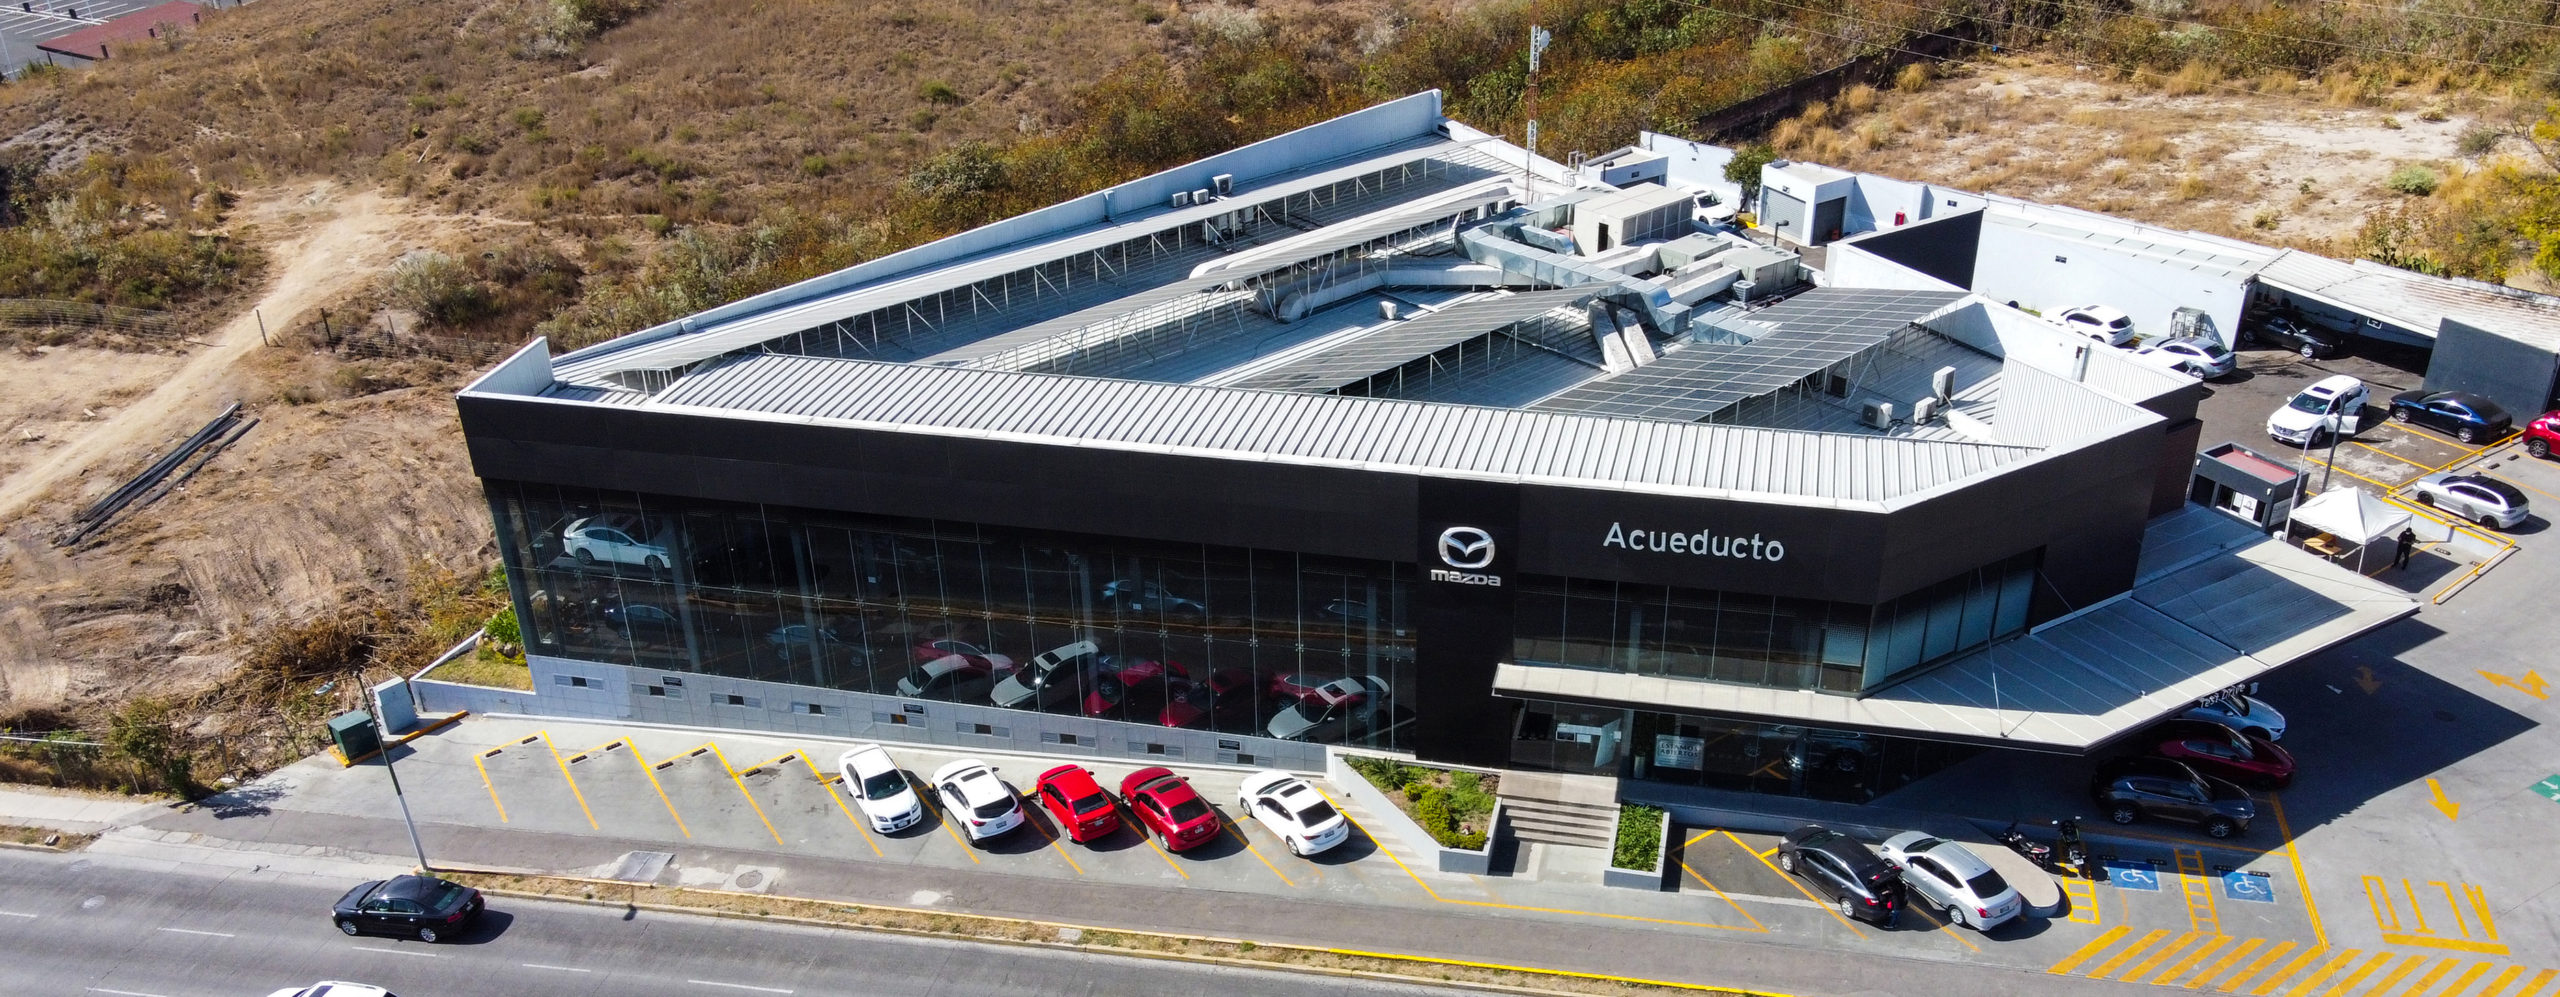 Mazda Acueducto